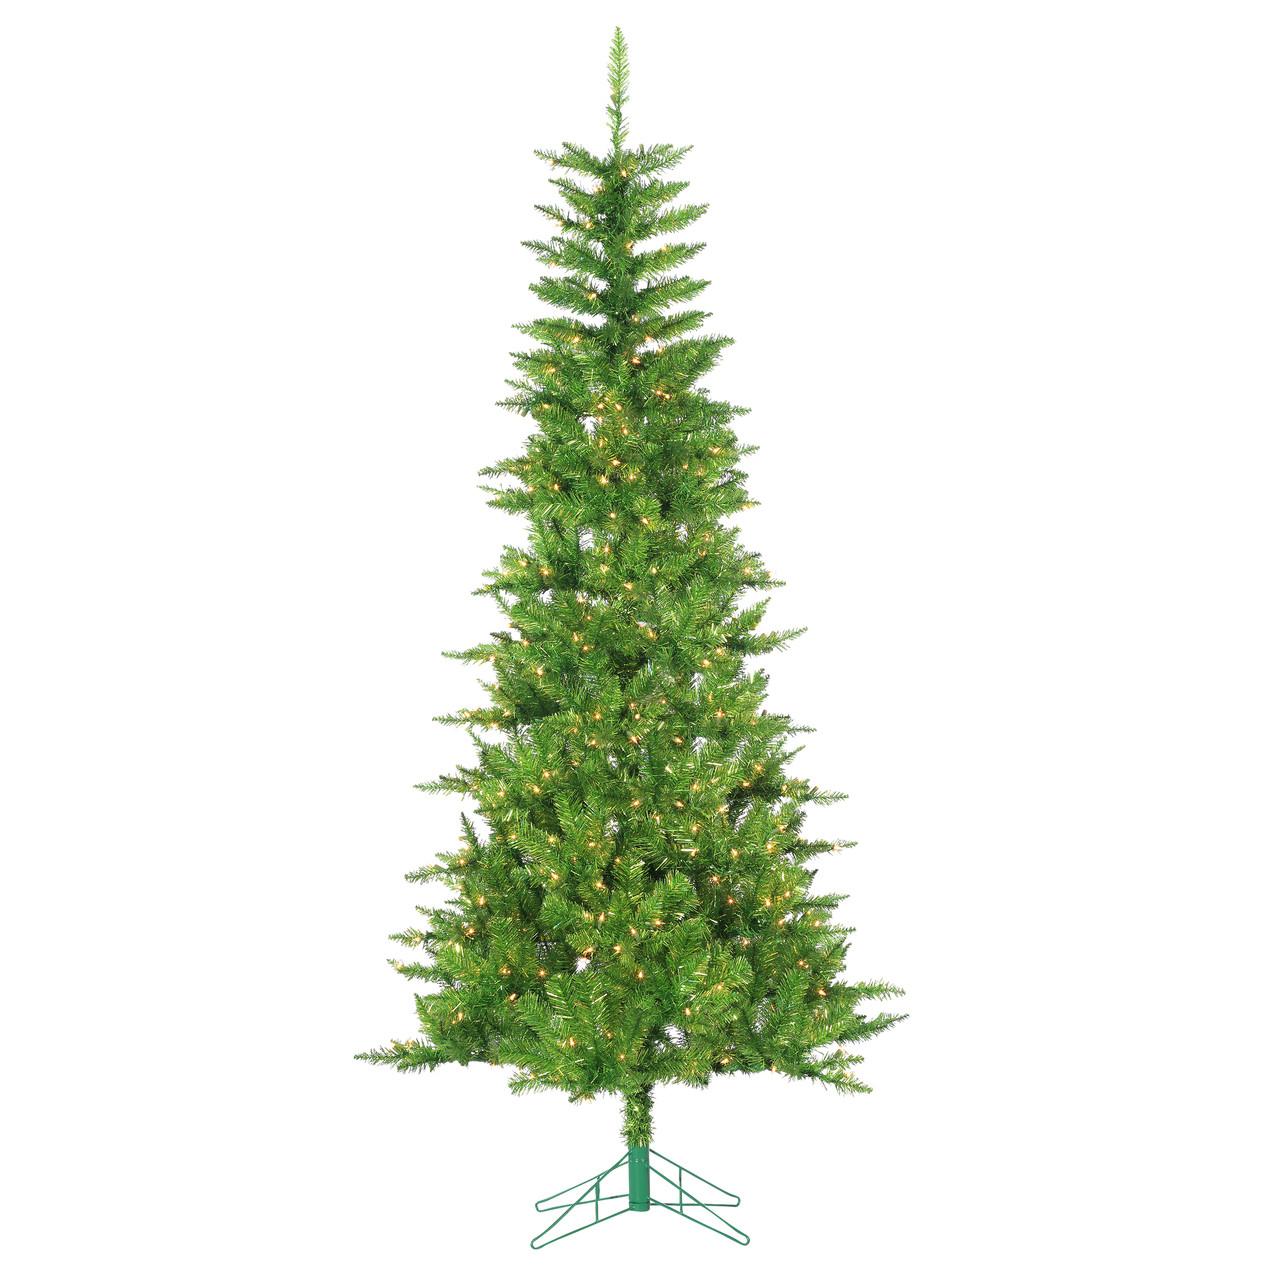 Christmas Tree Tinsel.7 5 Green Tuscany Tinsel Artificial Christmas Tree 6036 75lg